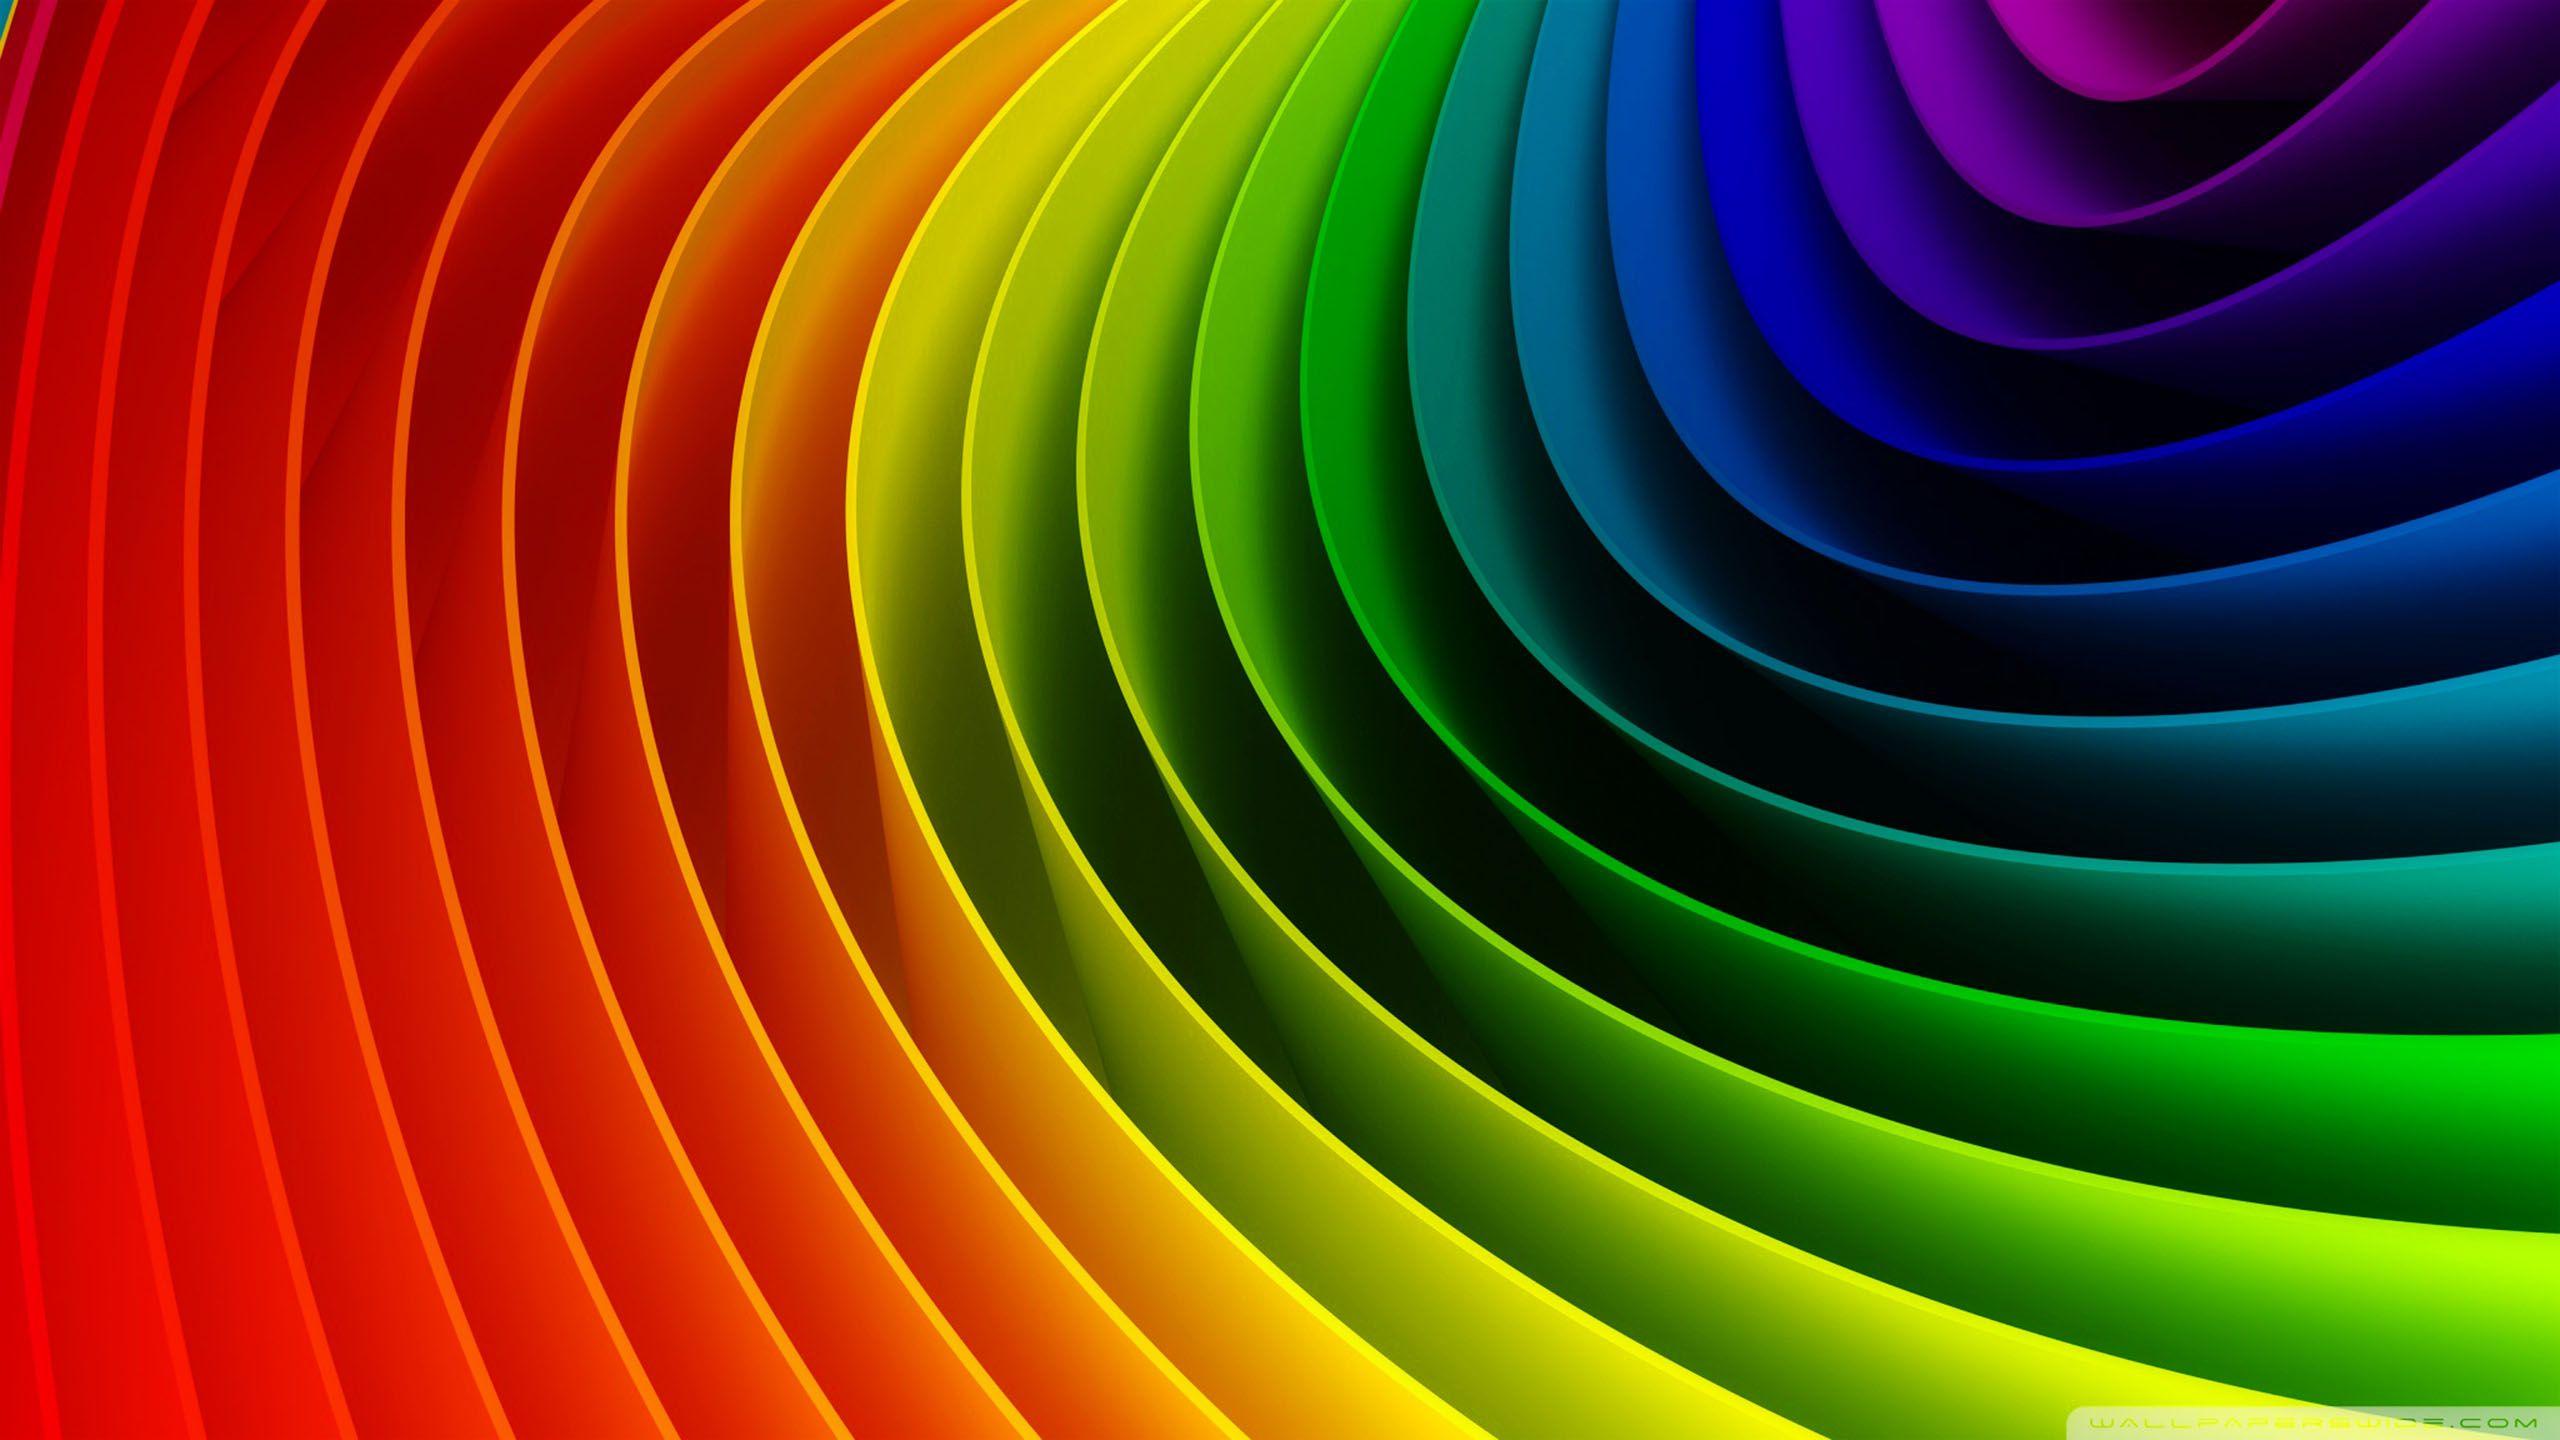 Rainbow Art Definition 1080 Hd Wallpaper Rainbow Wallpaper Rainbow Art Colorful Wallpaper